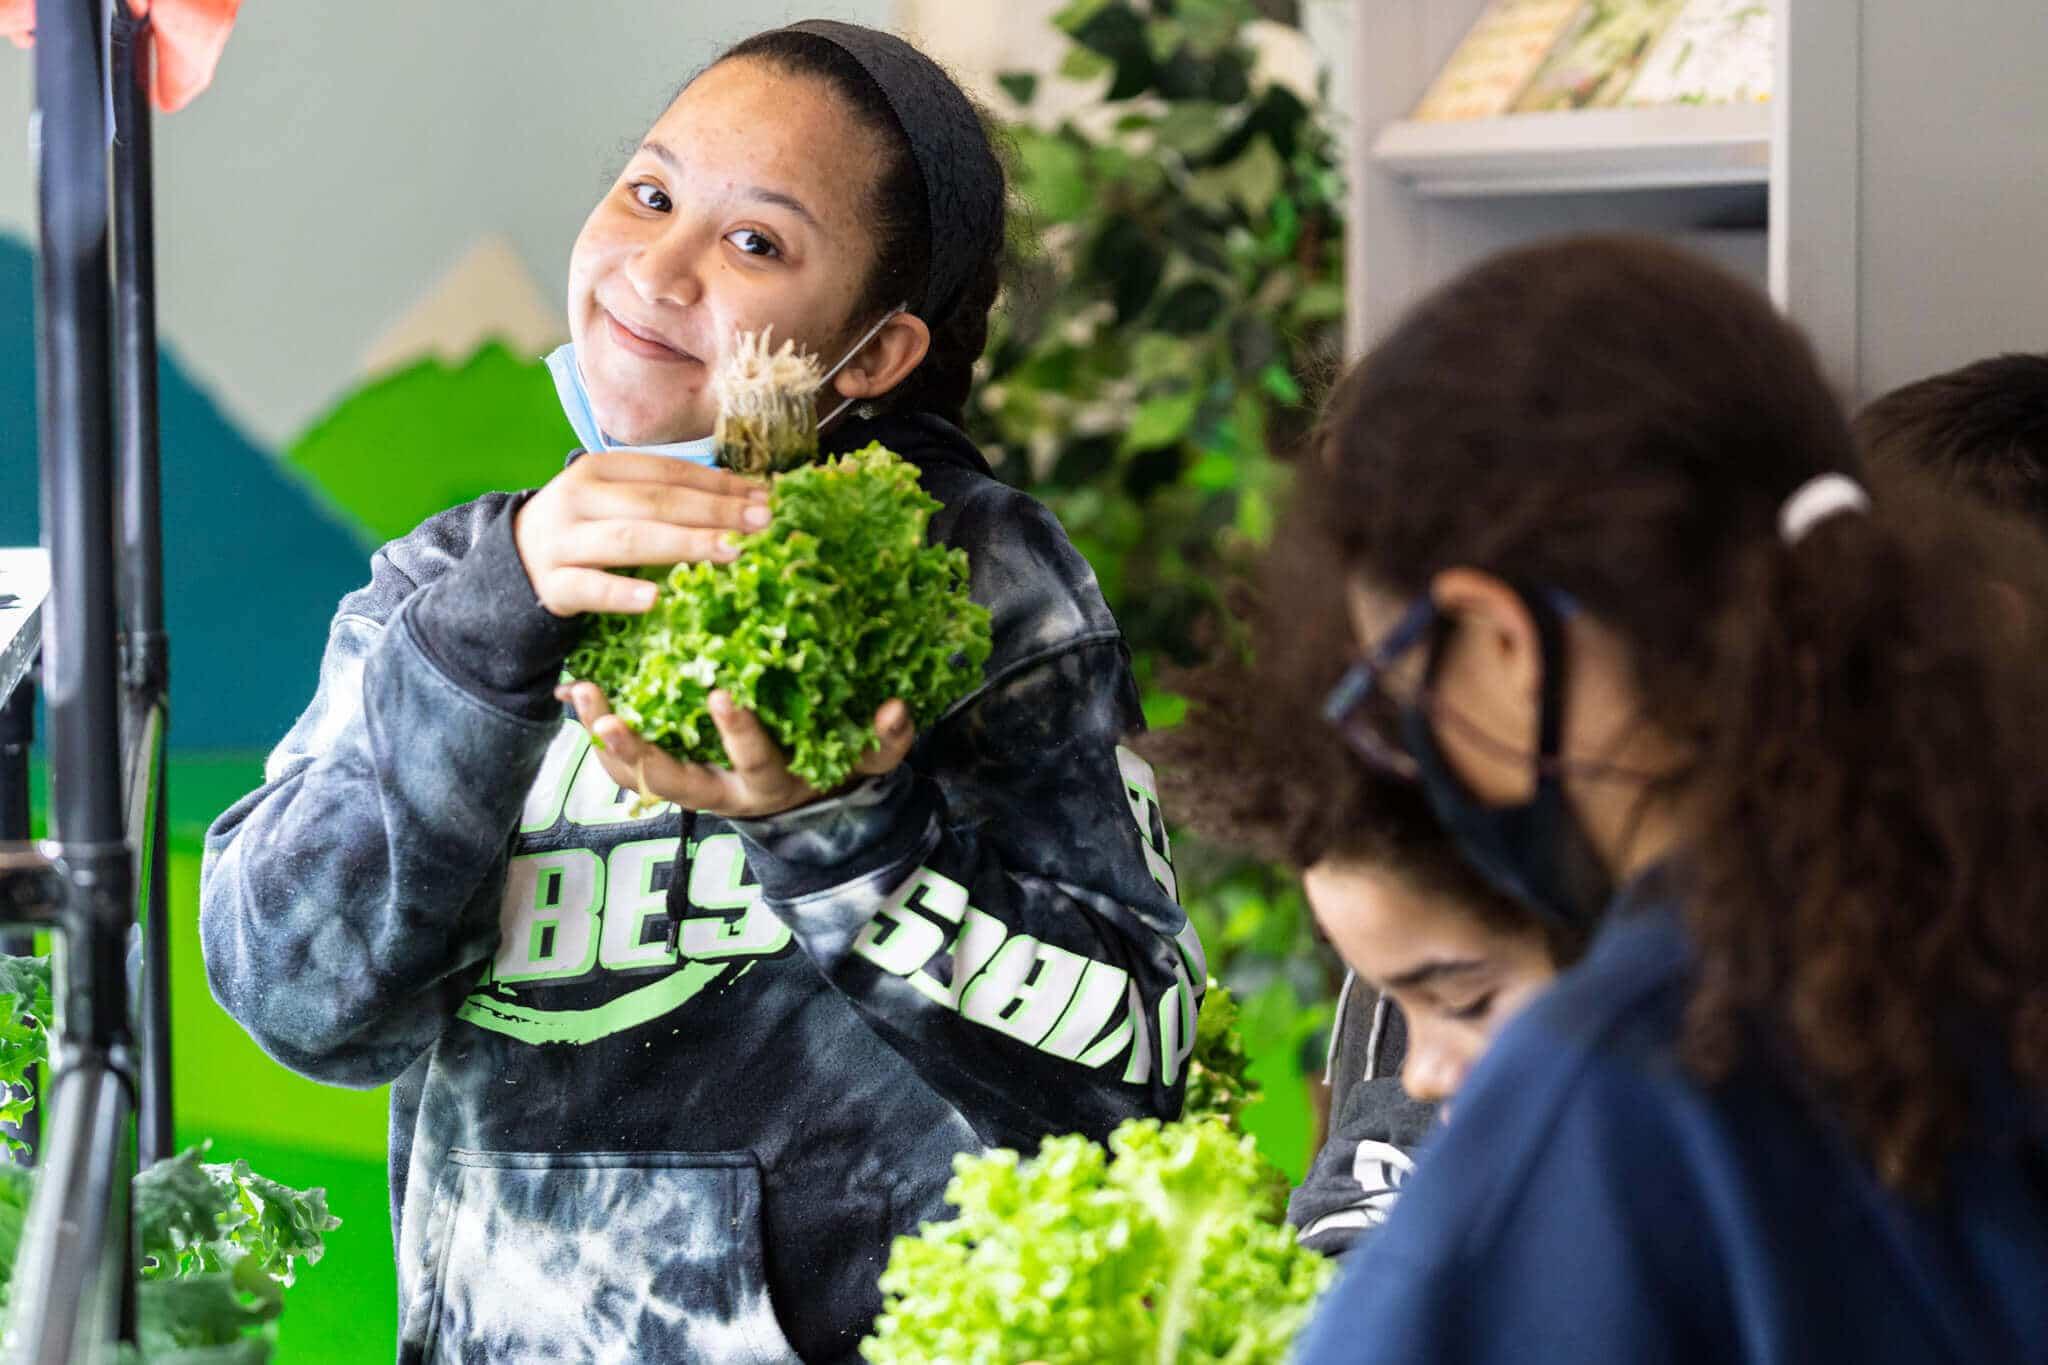 educational project kid school harvest